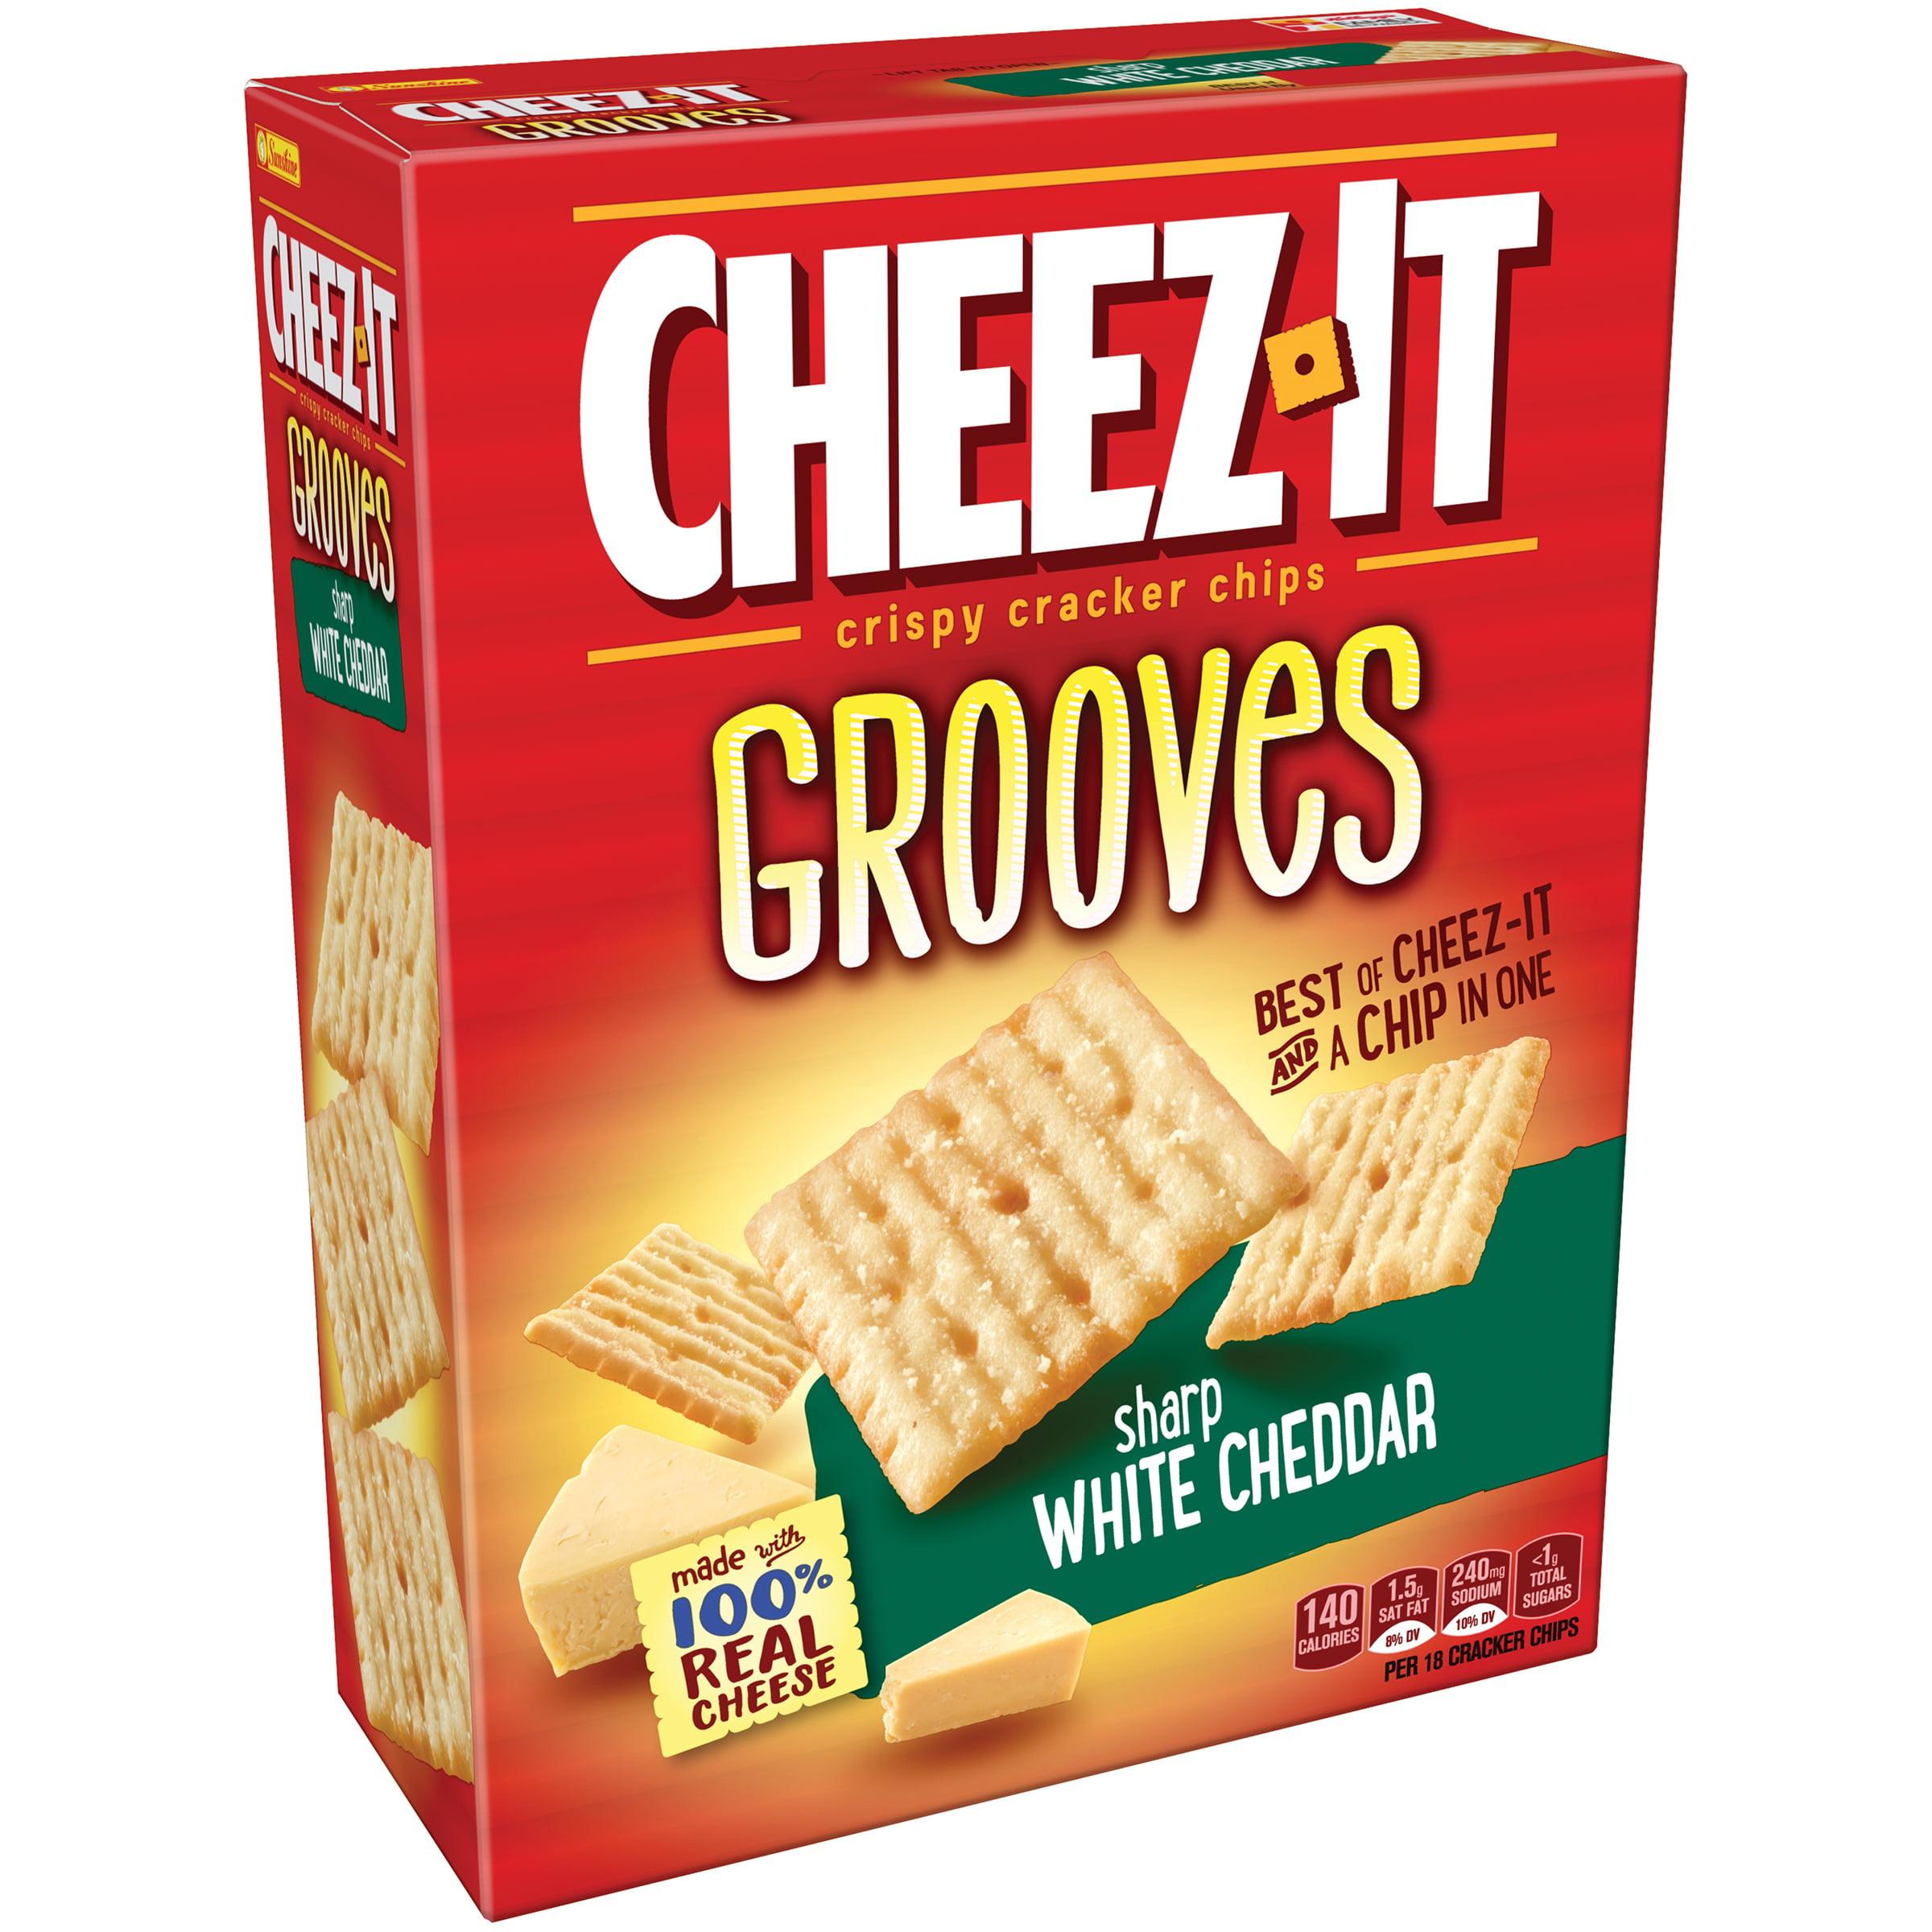 (2 Pack) Cheez-It Grooves Sharp White Cheddar Crispy Cracker Chips 9 oz